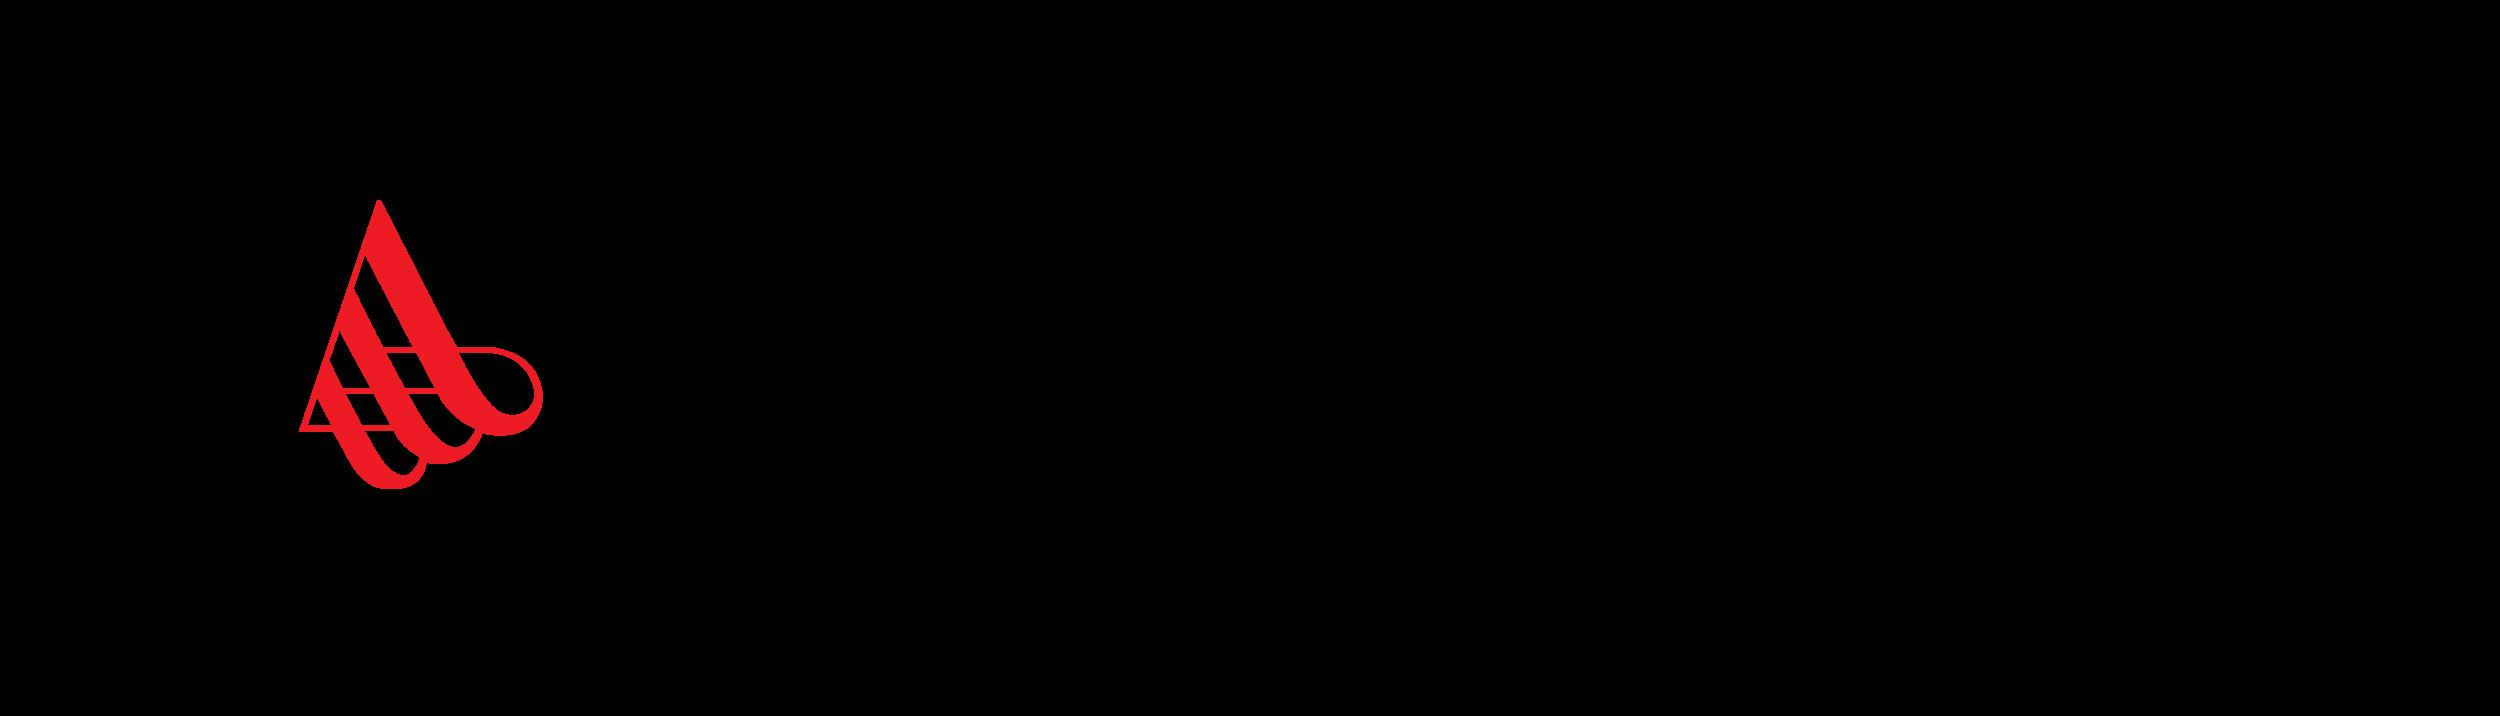 njca_logo_statement_full_color_black.png